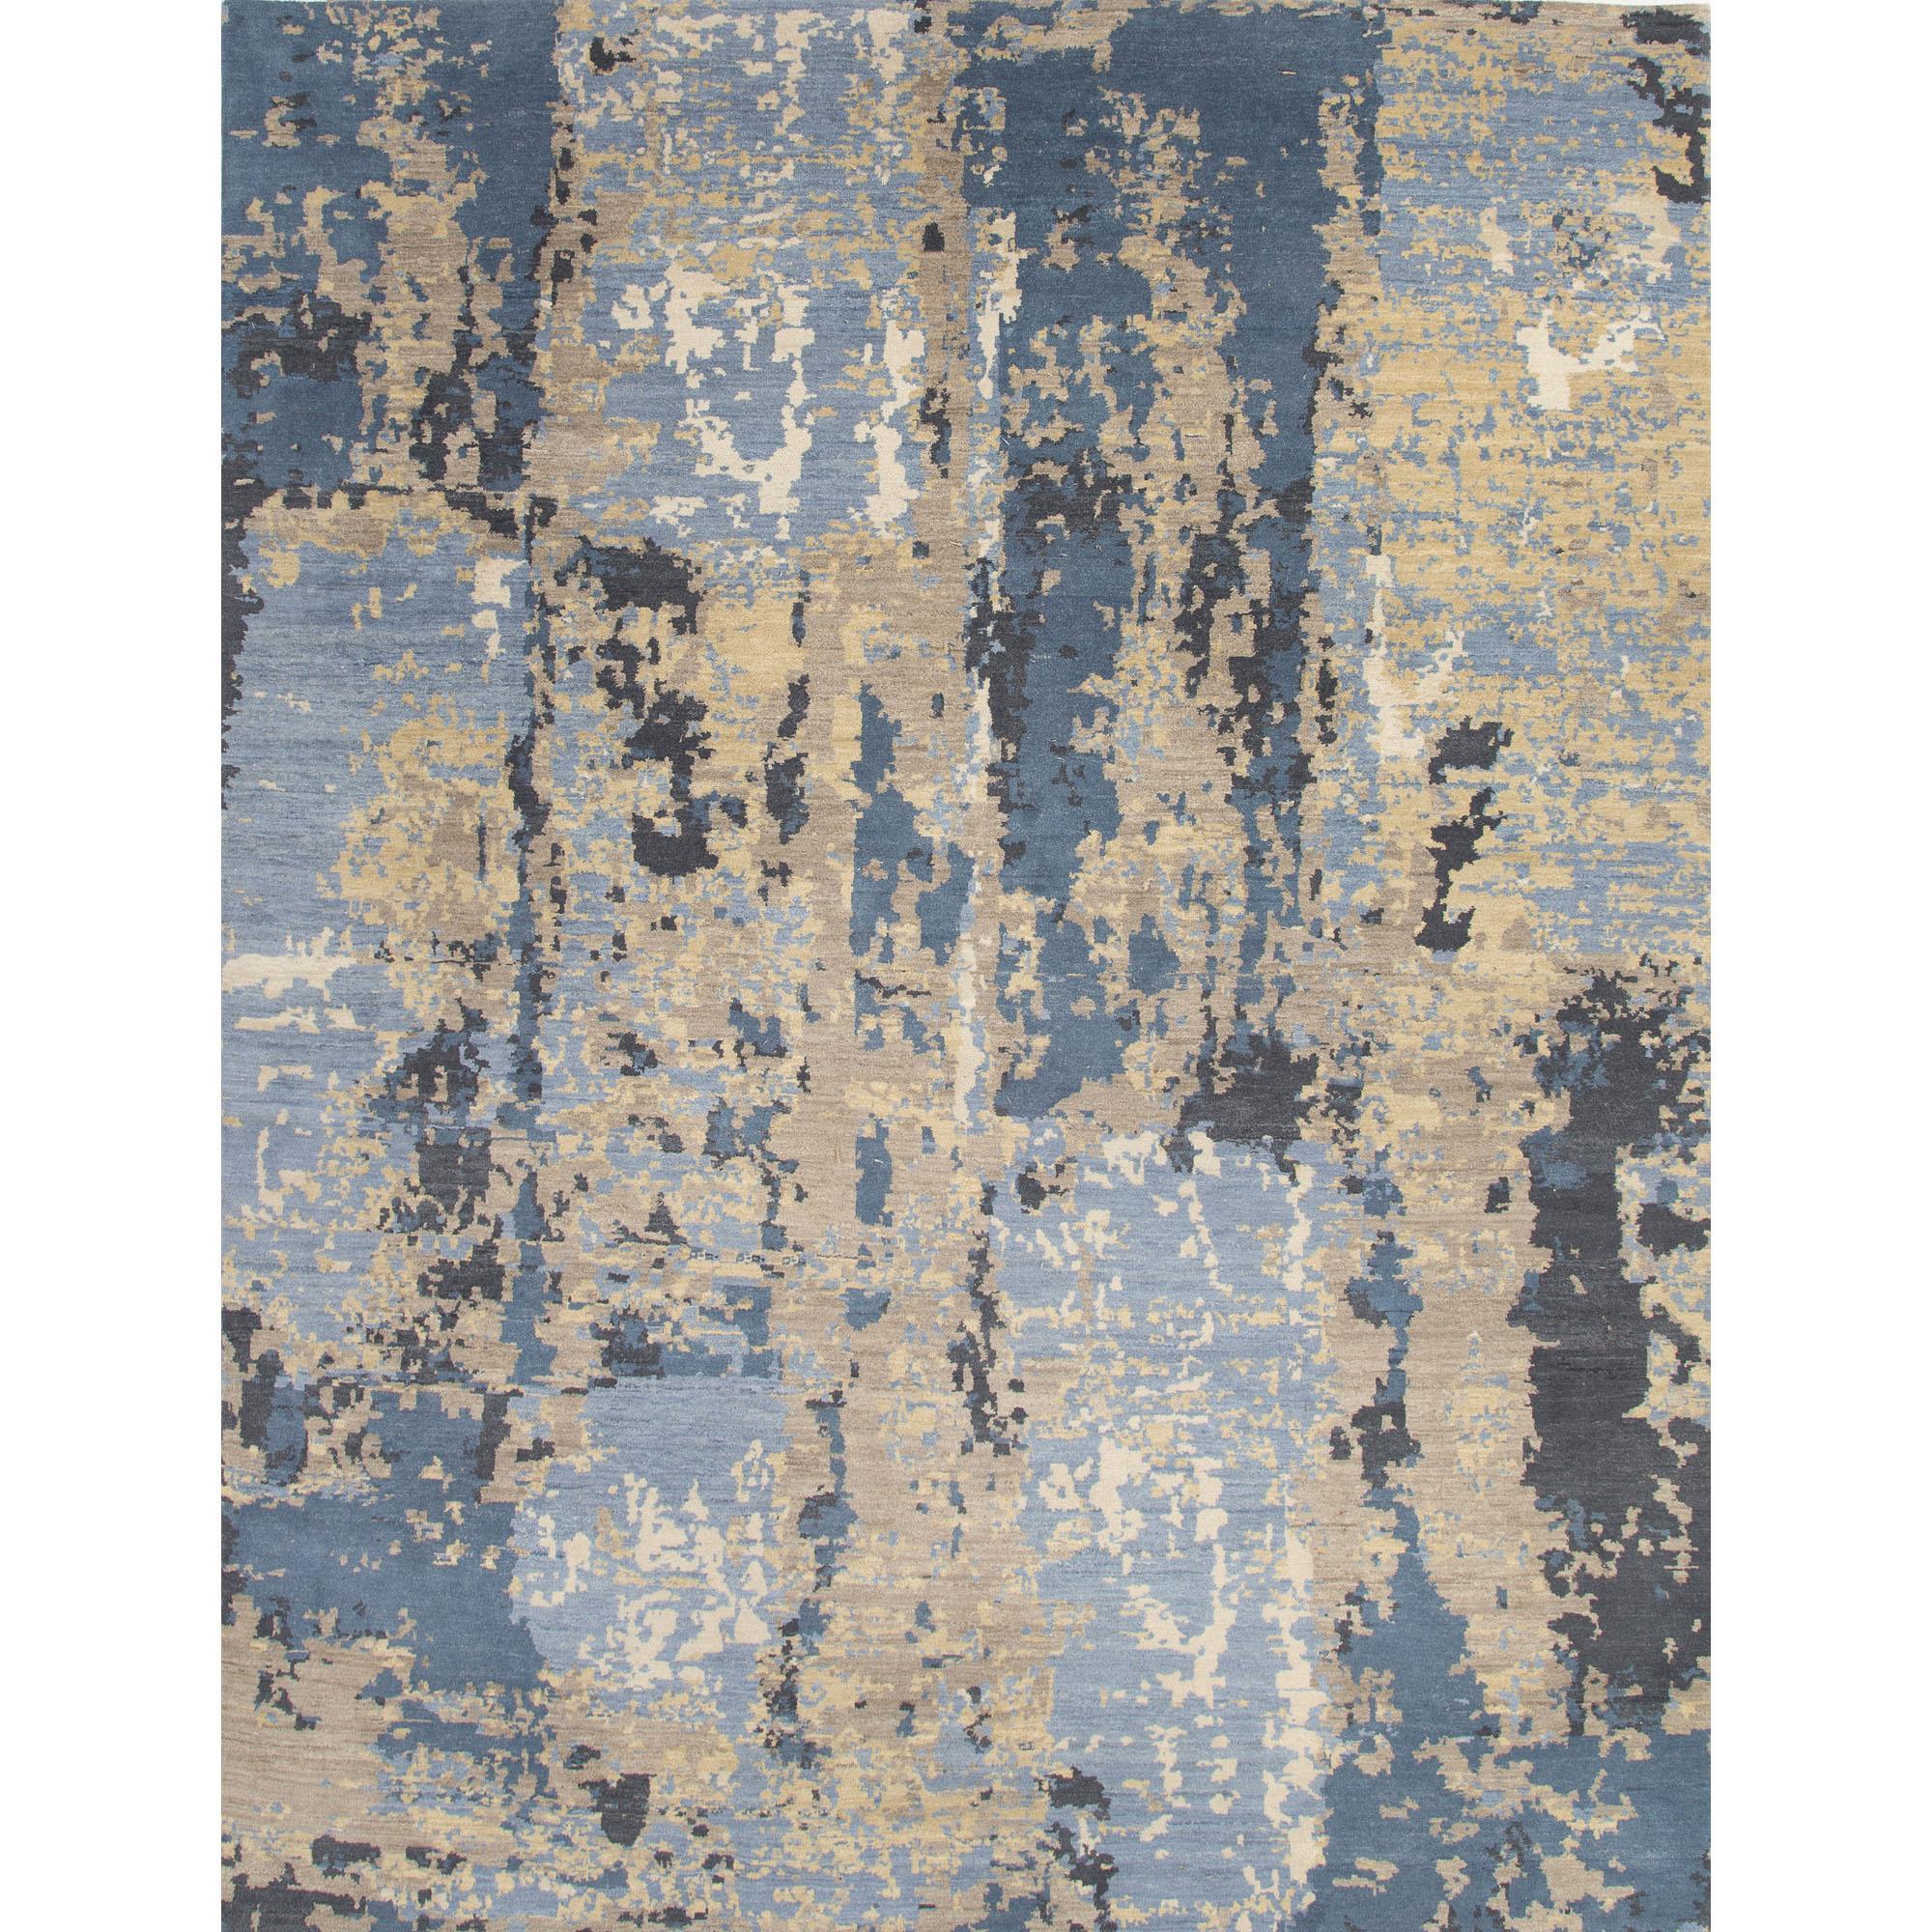 JAIPUR Rugs Connextion By Jenny Jones-global 10 x 14 Rug - Item Number: RUG113766